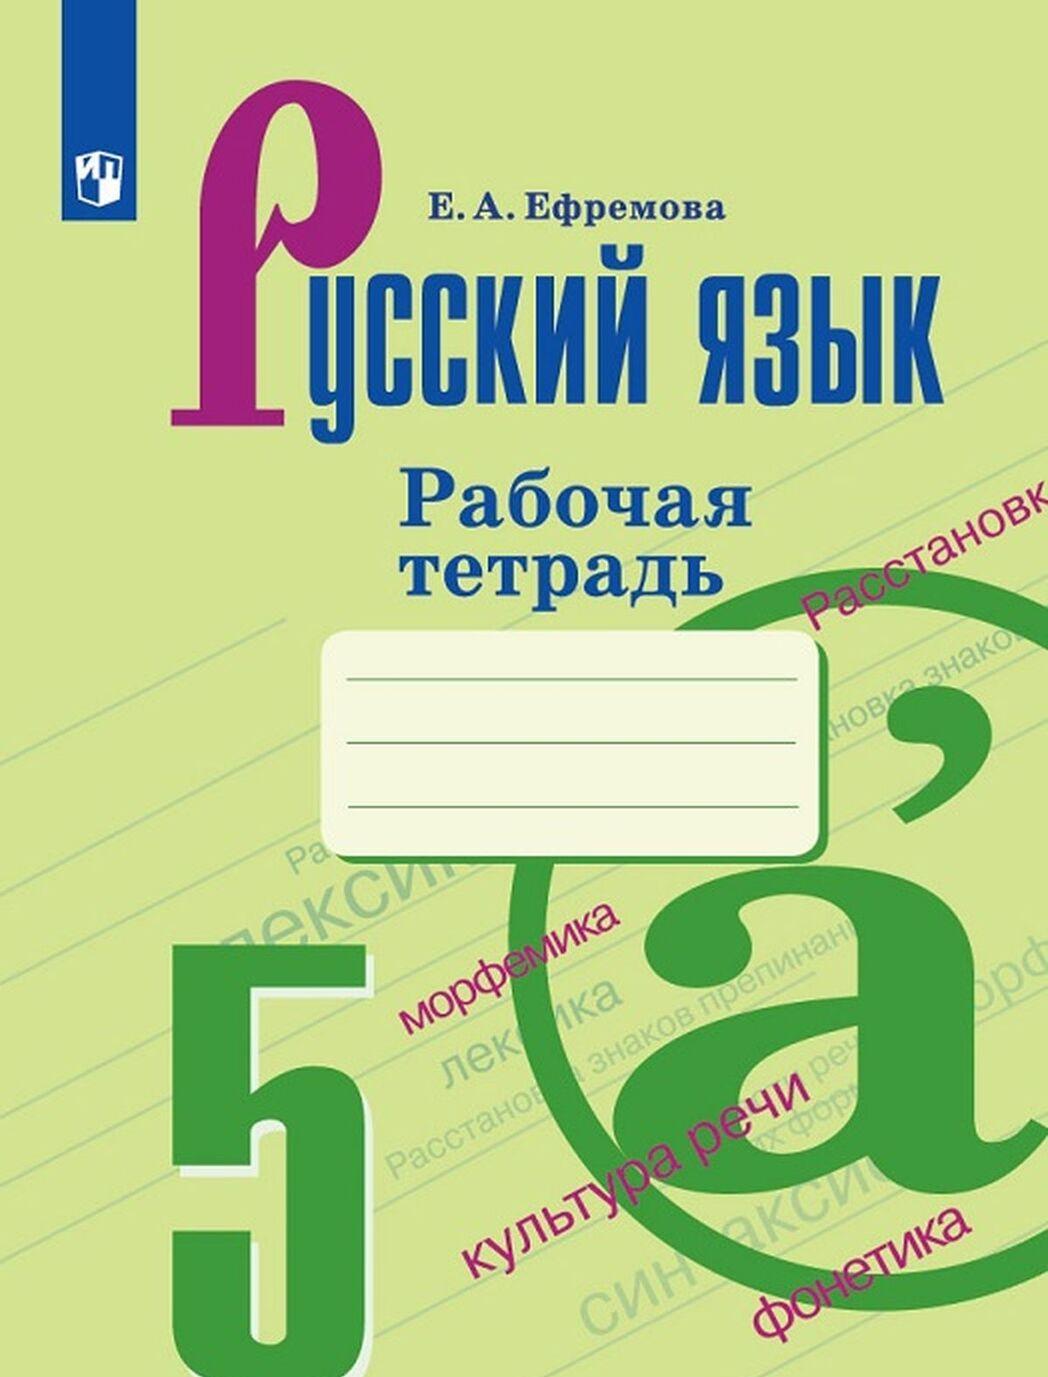 Russkij jazyk. Rabochaja tetrad. 5 klass